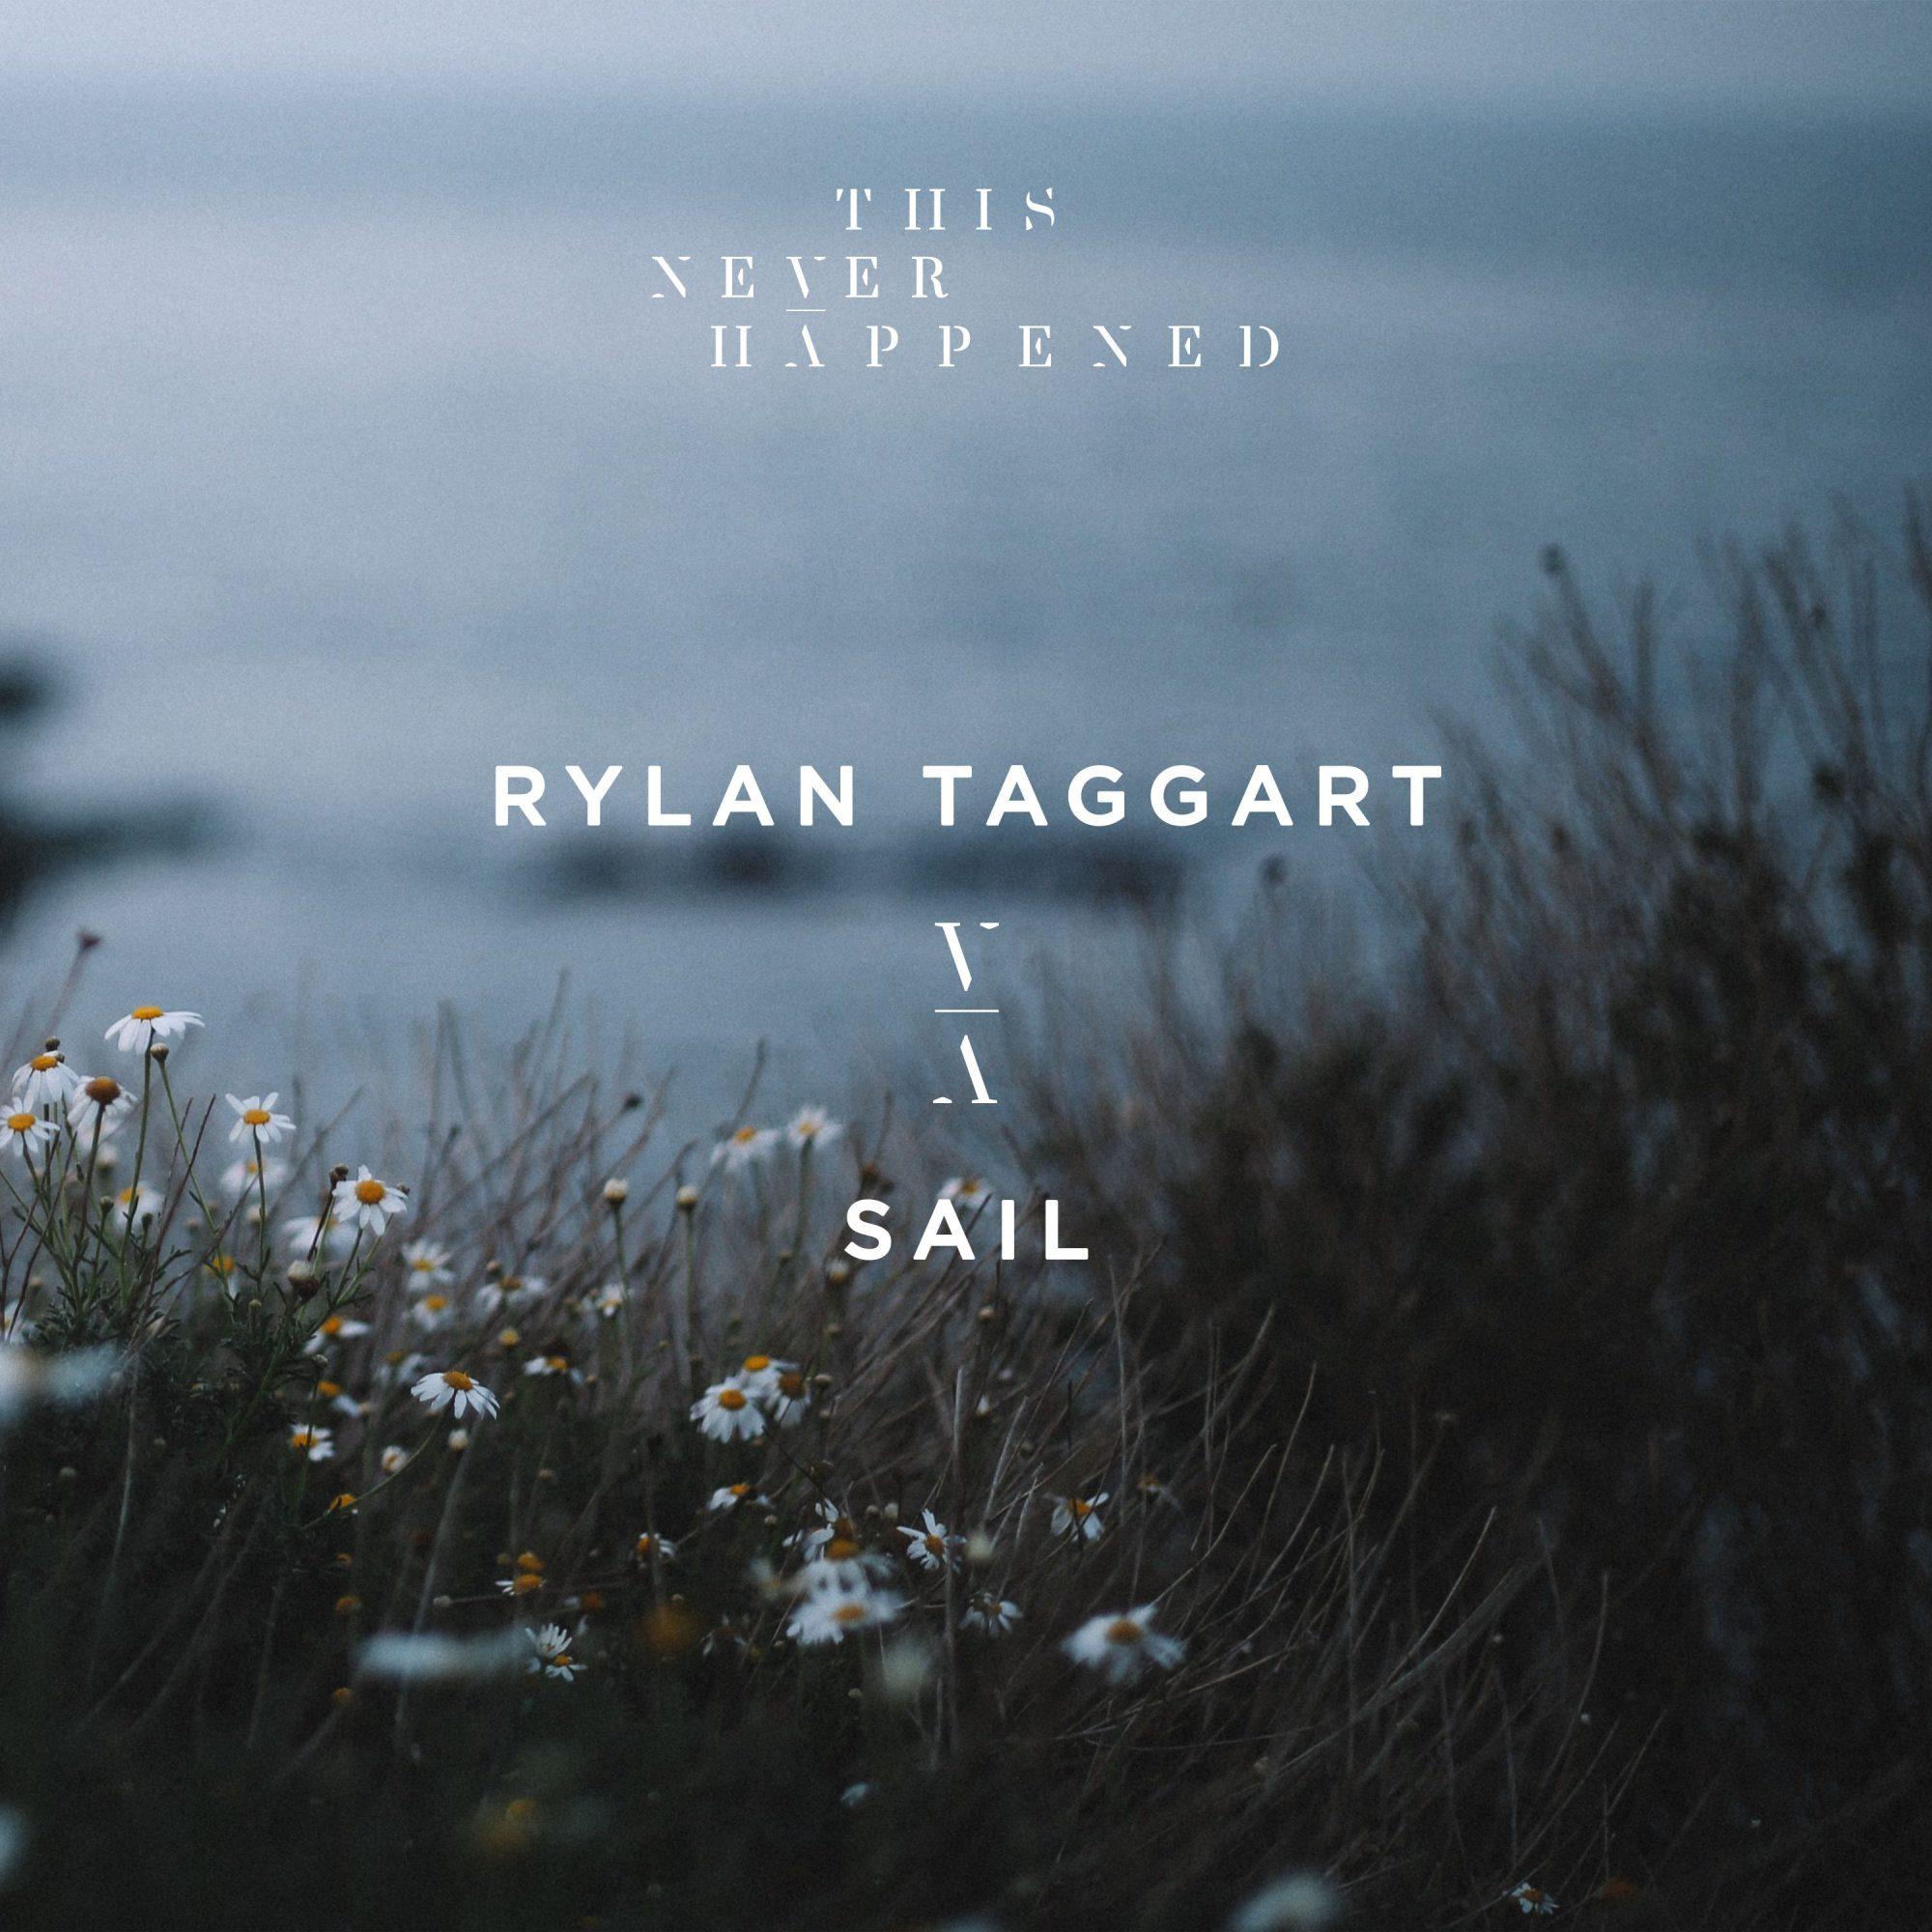 Rylan Taggart Sail This Never Happened